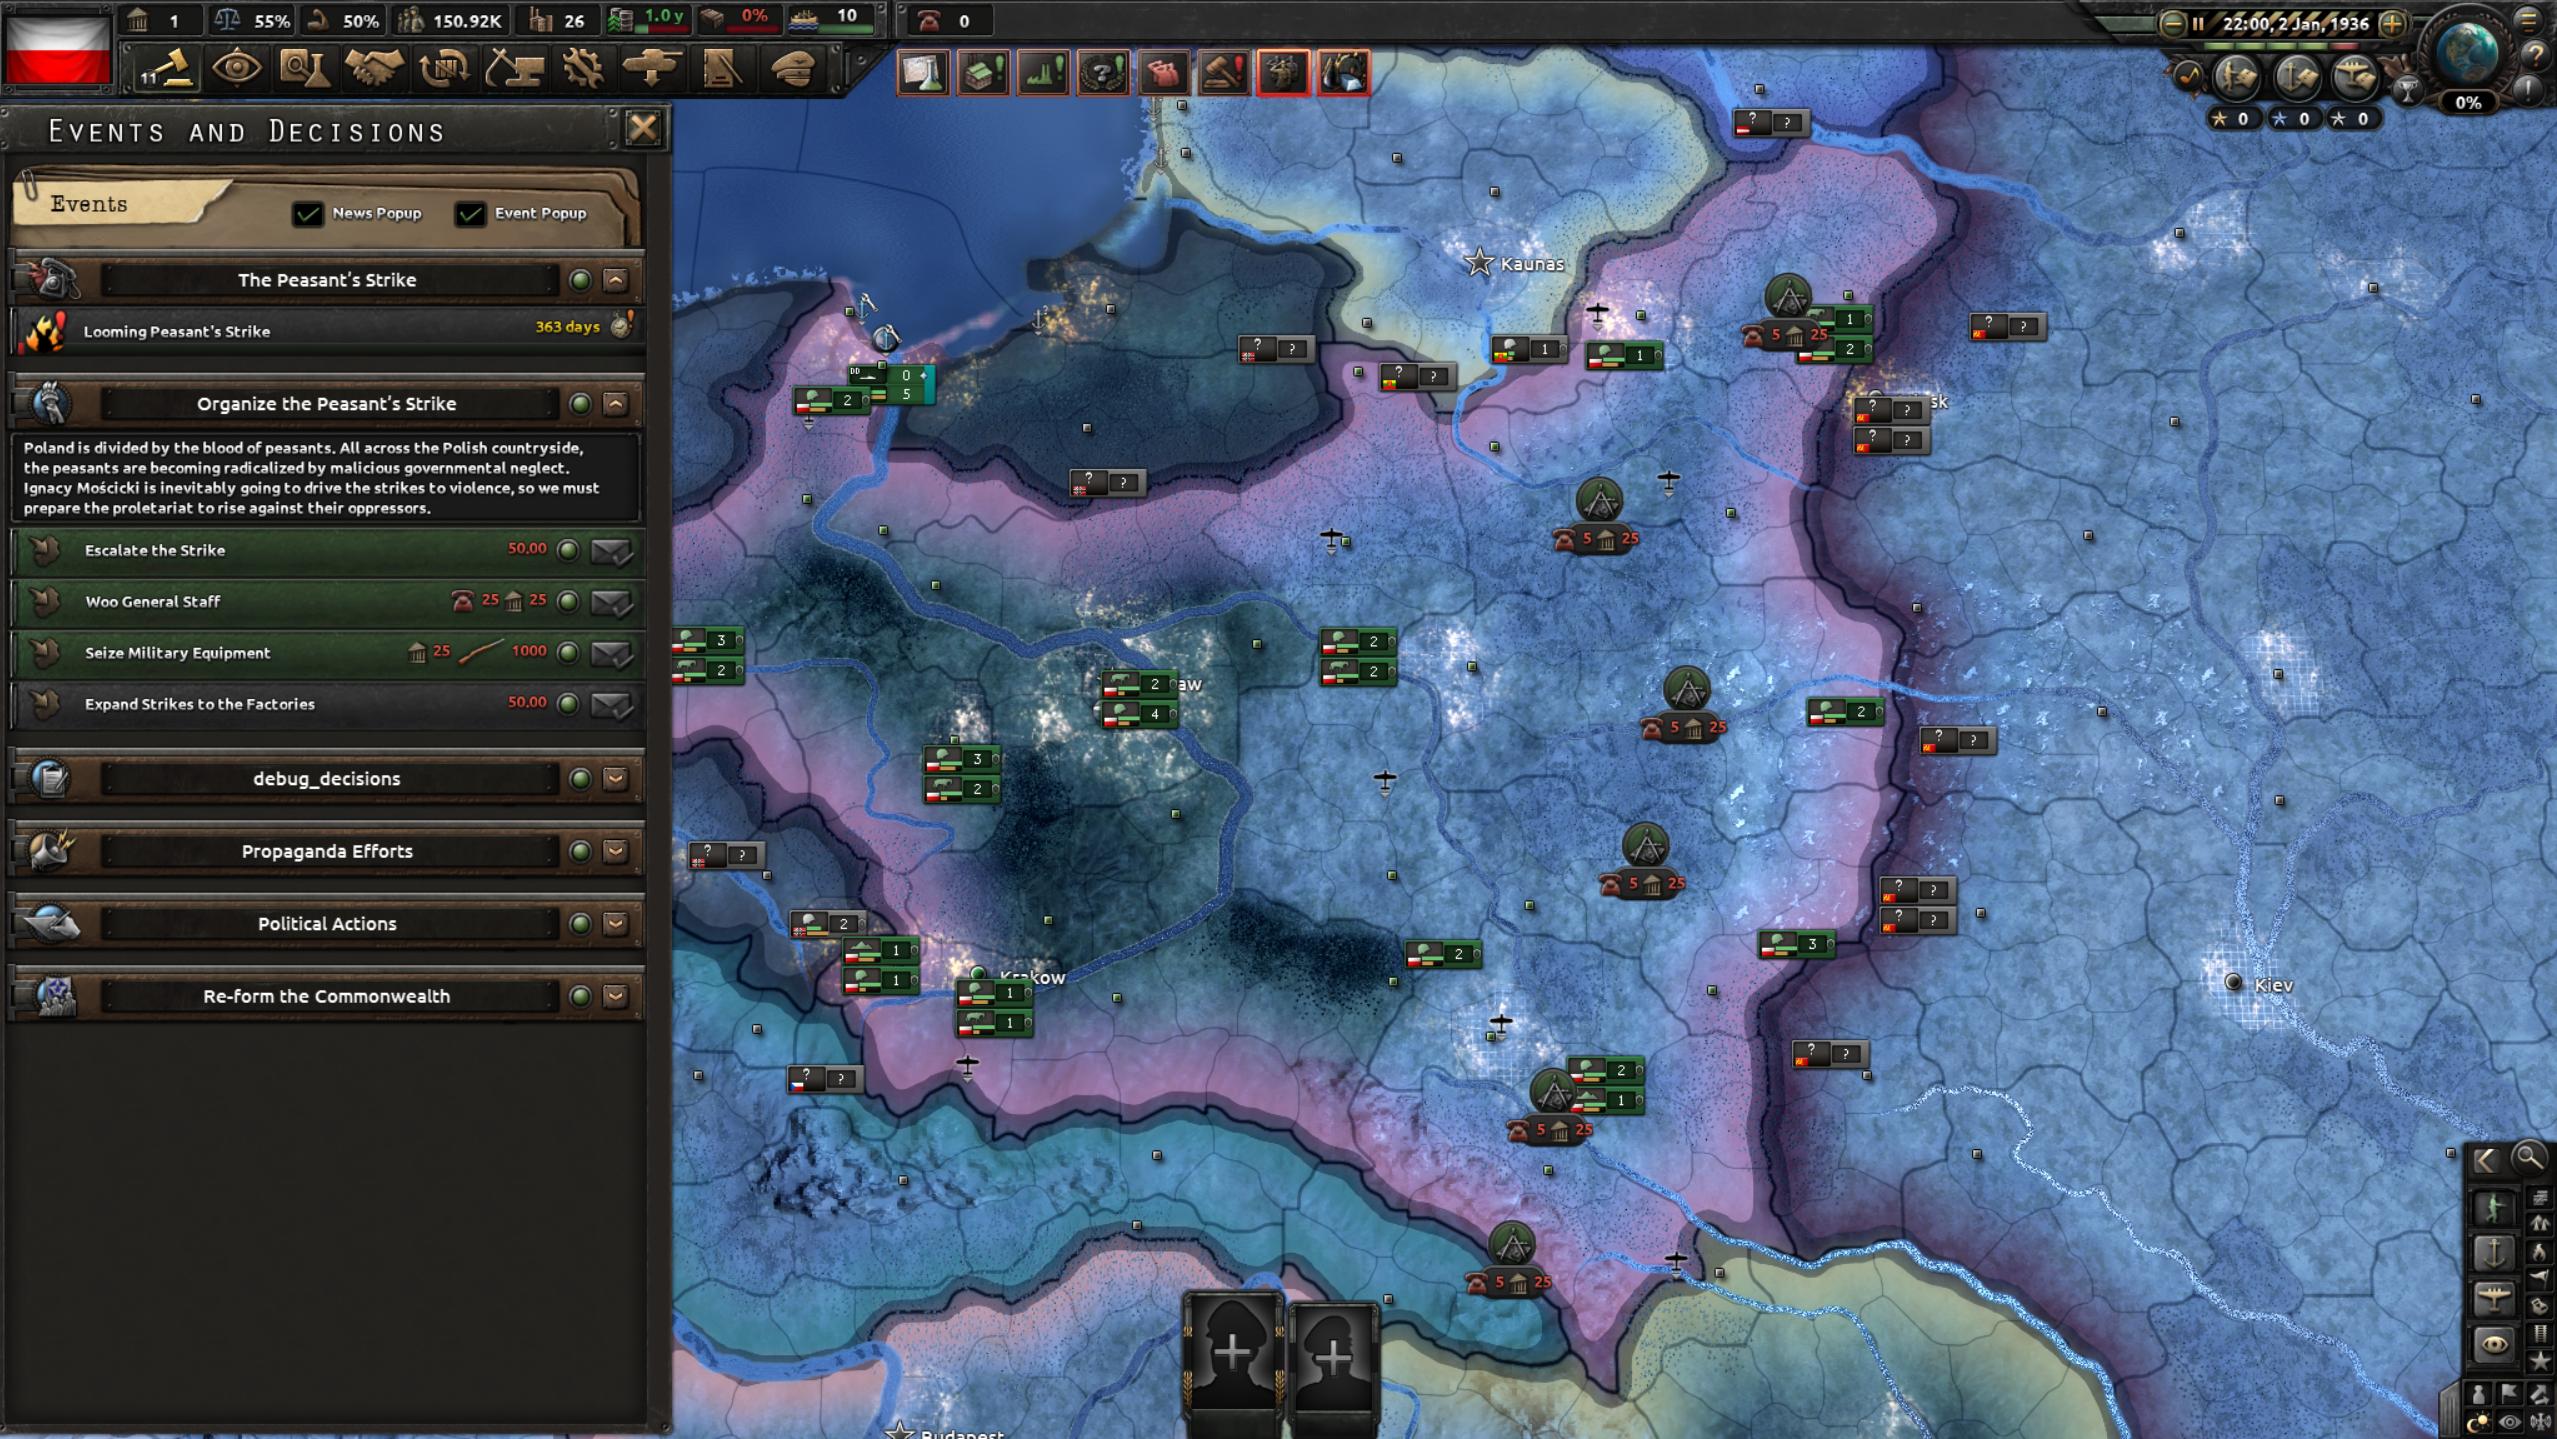 peasant_strike_claim_states.png